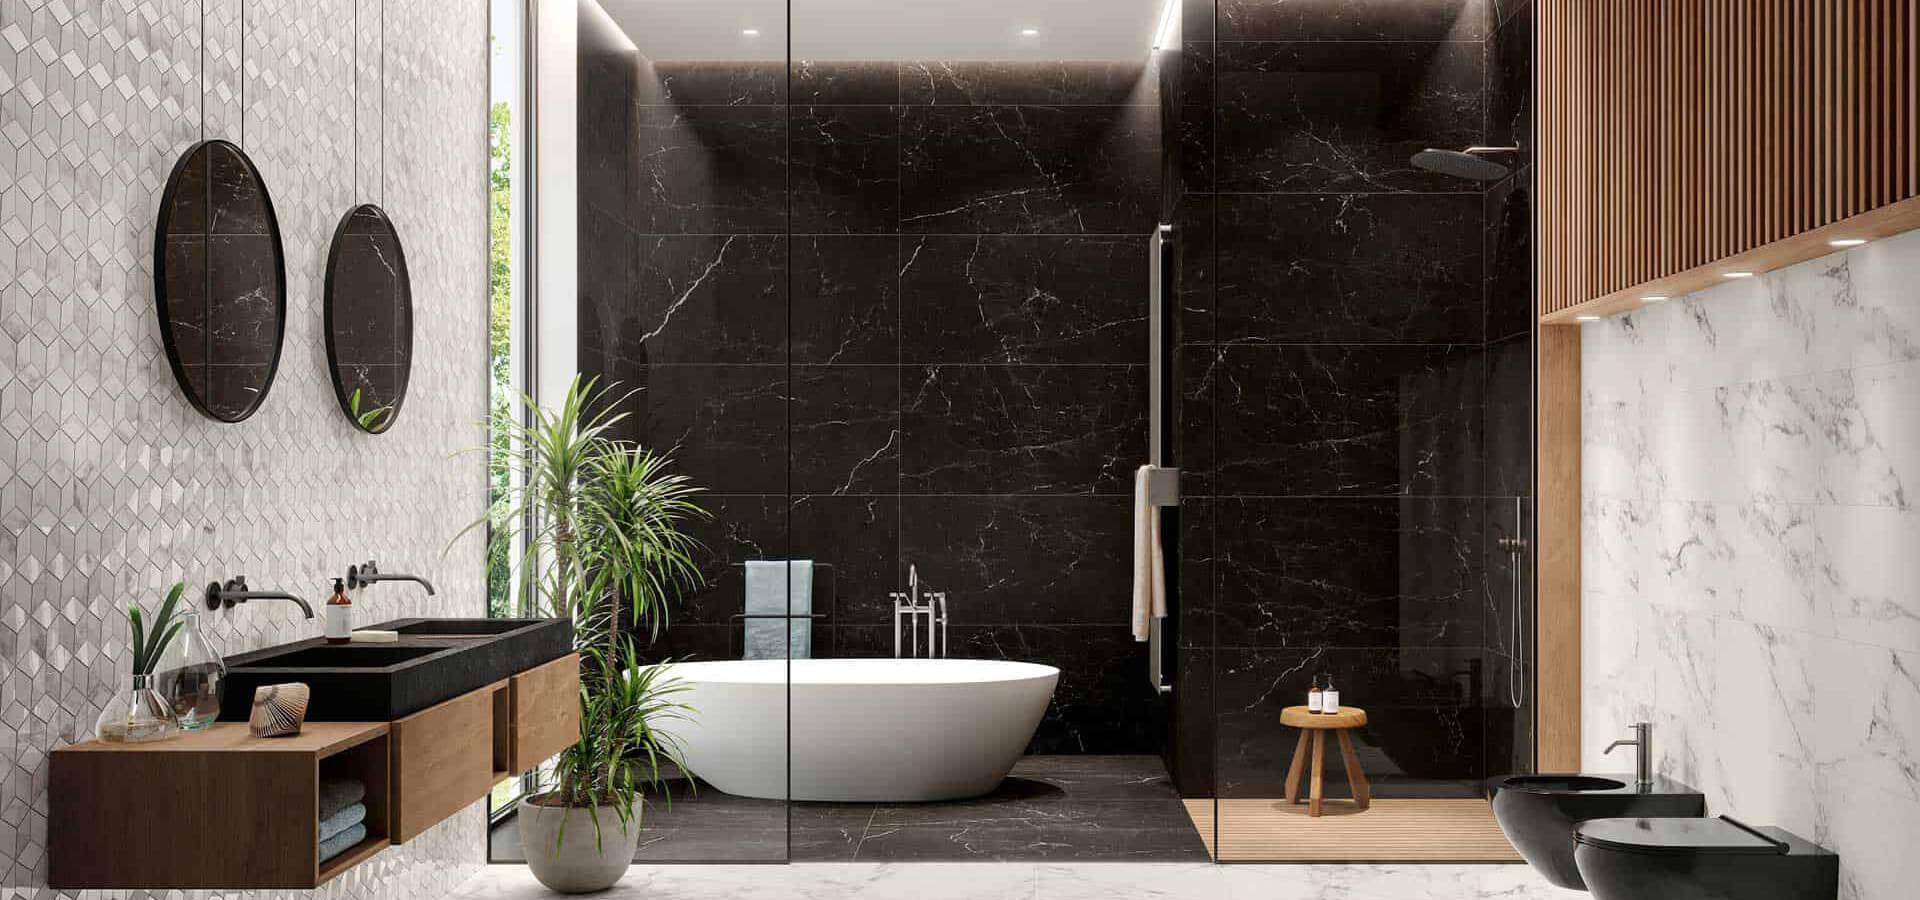 Cerbis Ceramics SA bathroom tiles and splashbacks